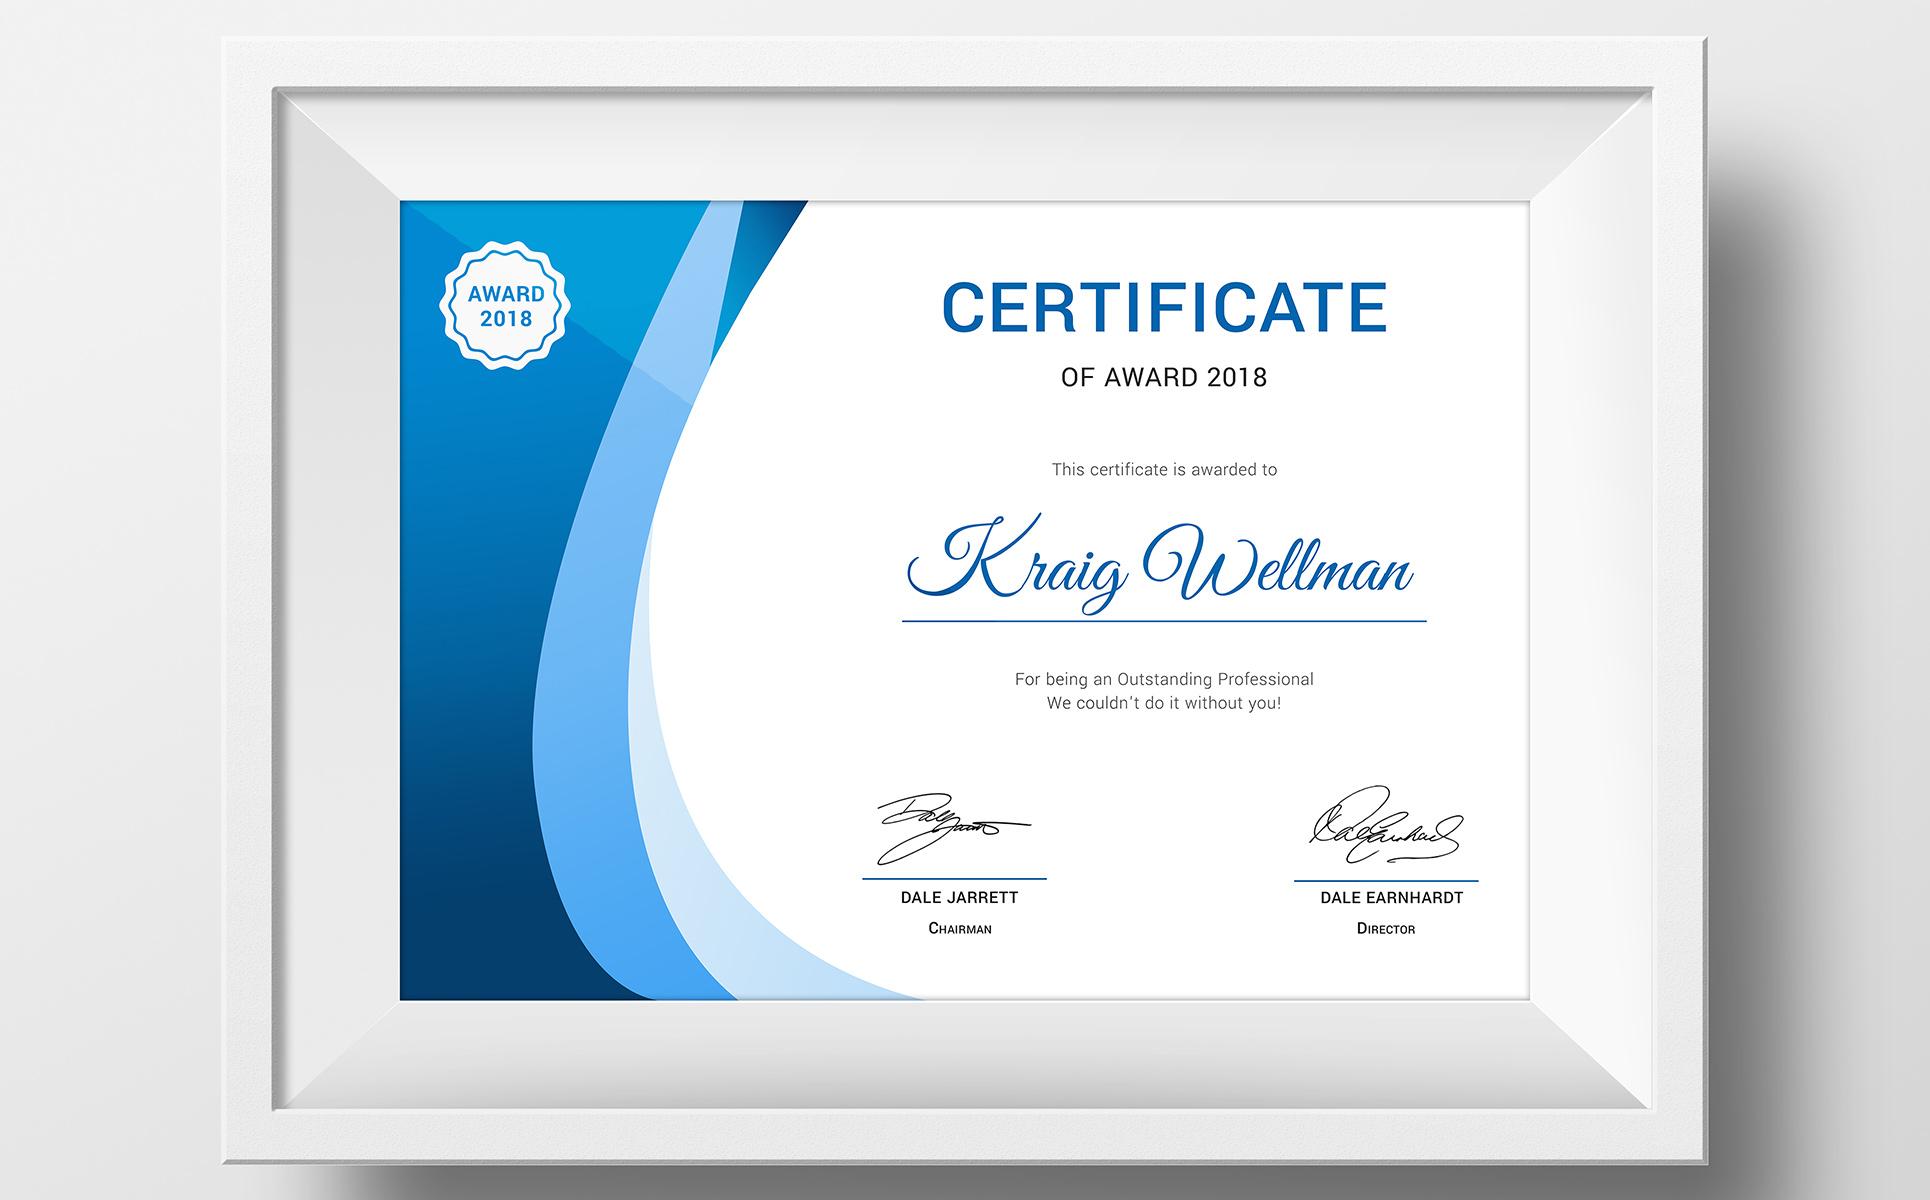 Award Certificate Template 73891